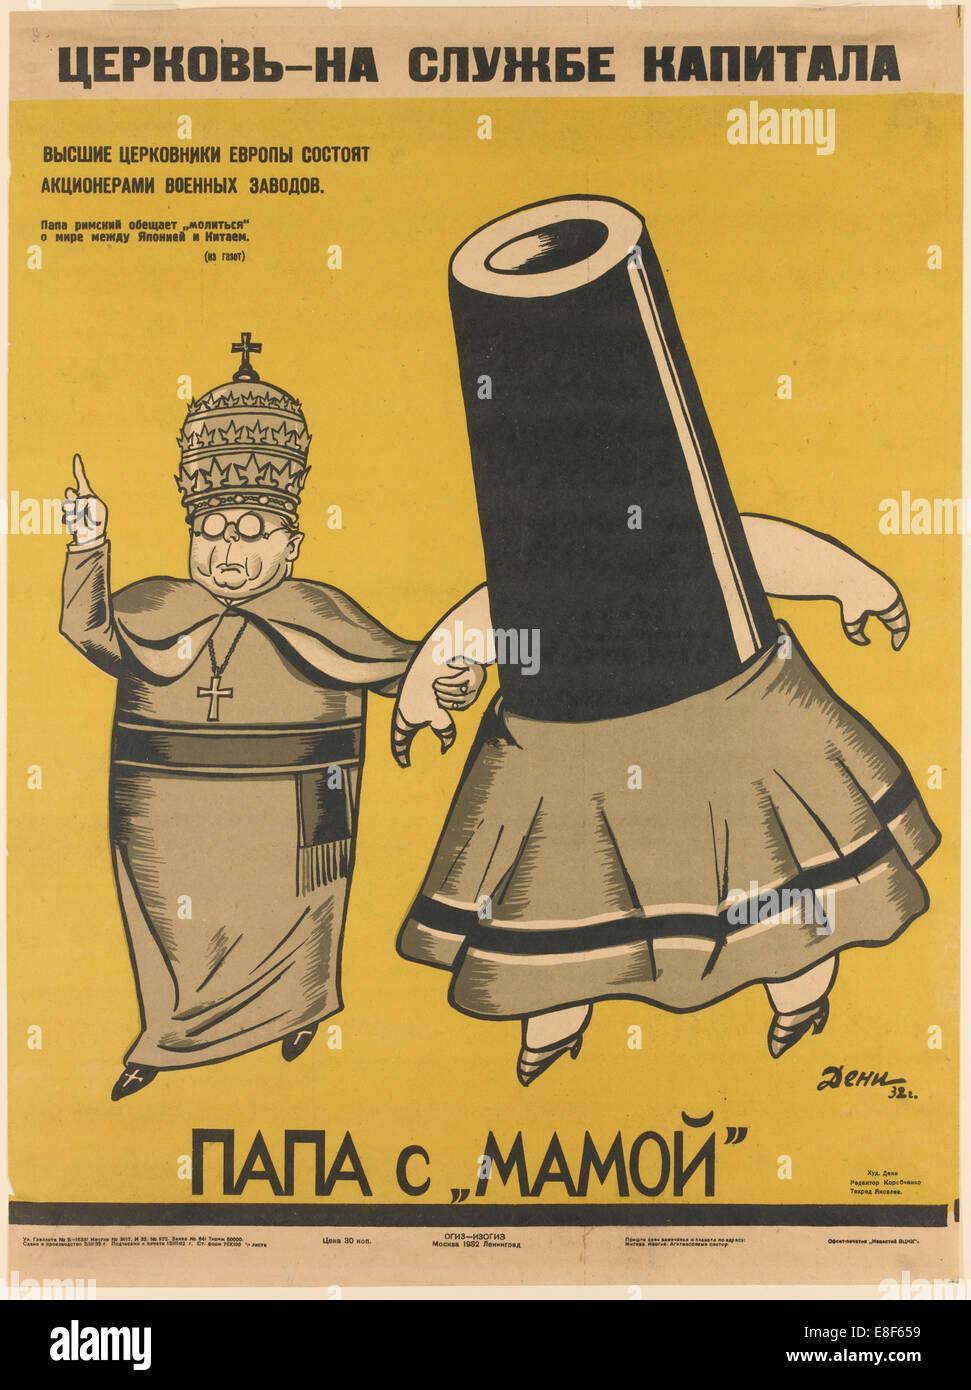 Church is working for the Capitalists. Artist: Deni (Denisov), Viktor Nikolaevich (1893-1946) - Stock Image